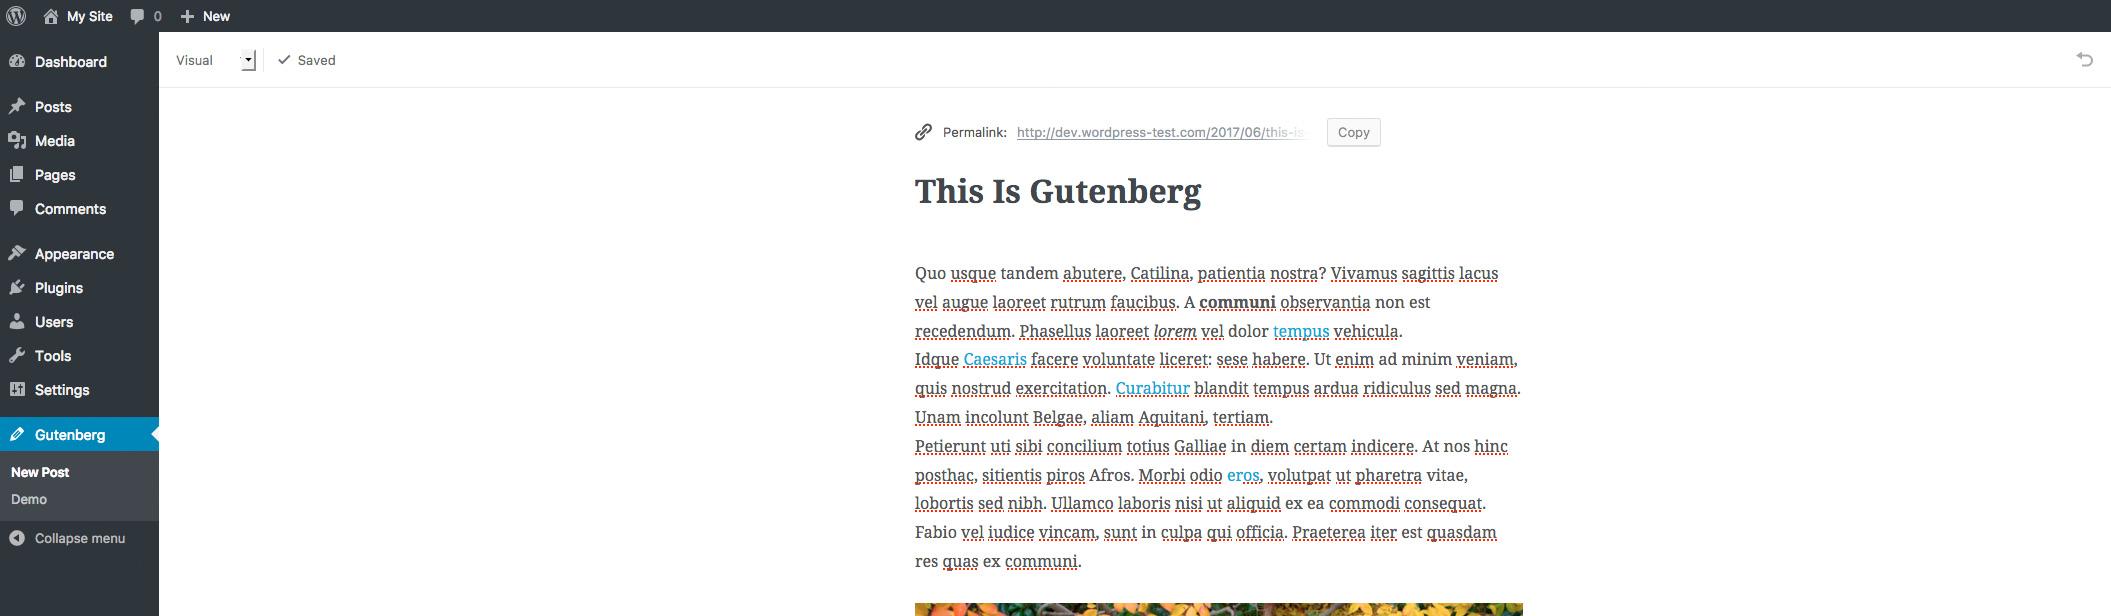 gutenberg-permalink-hover